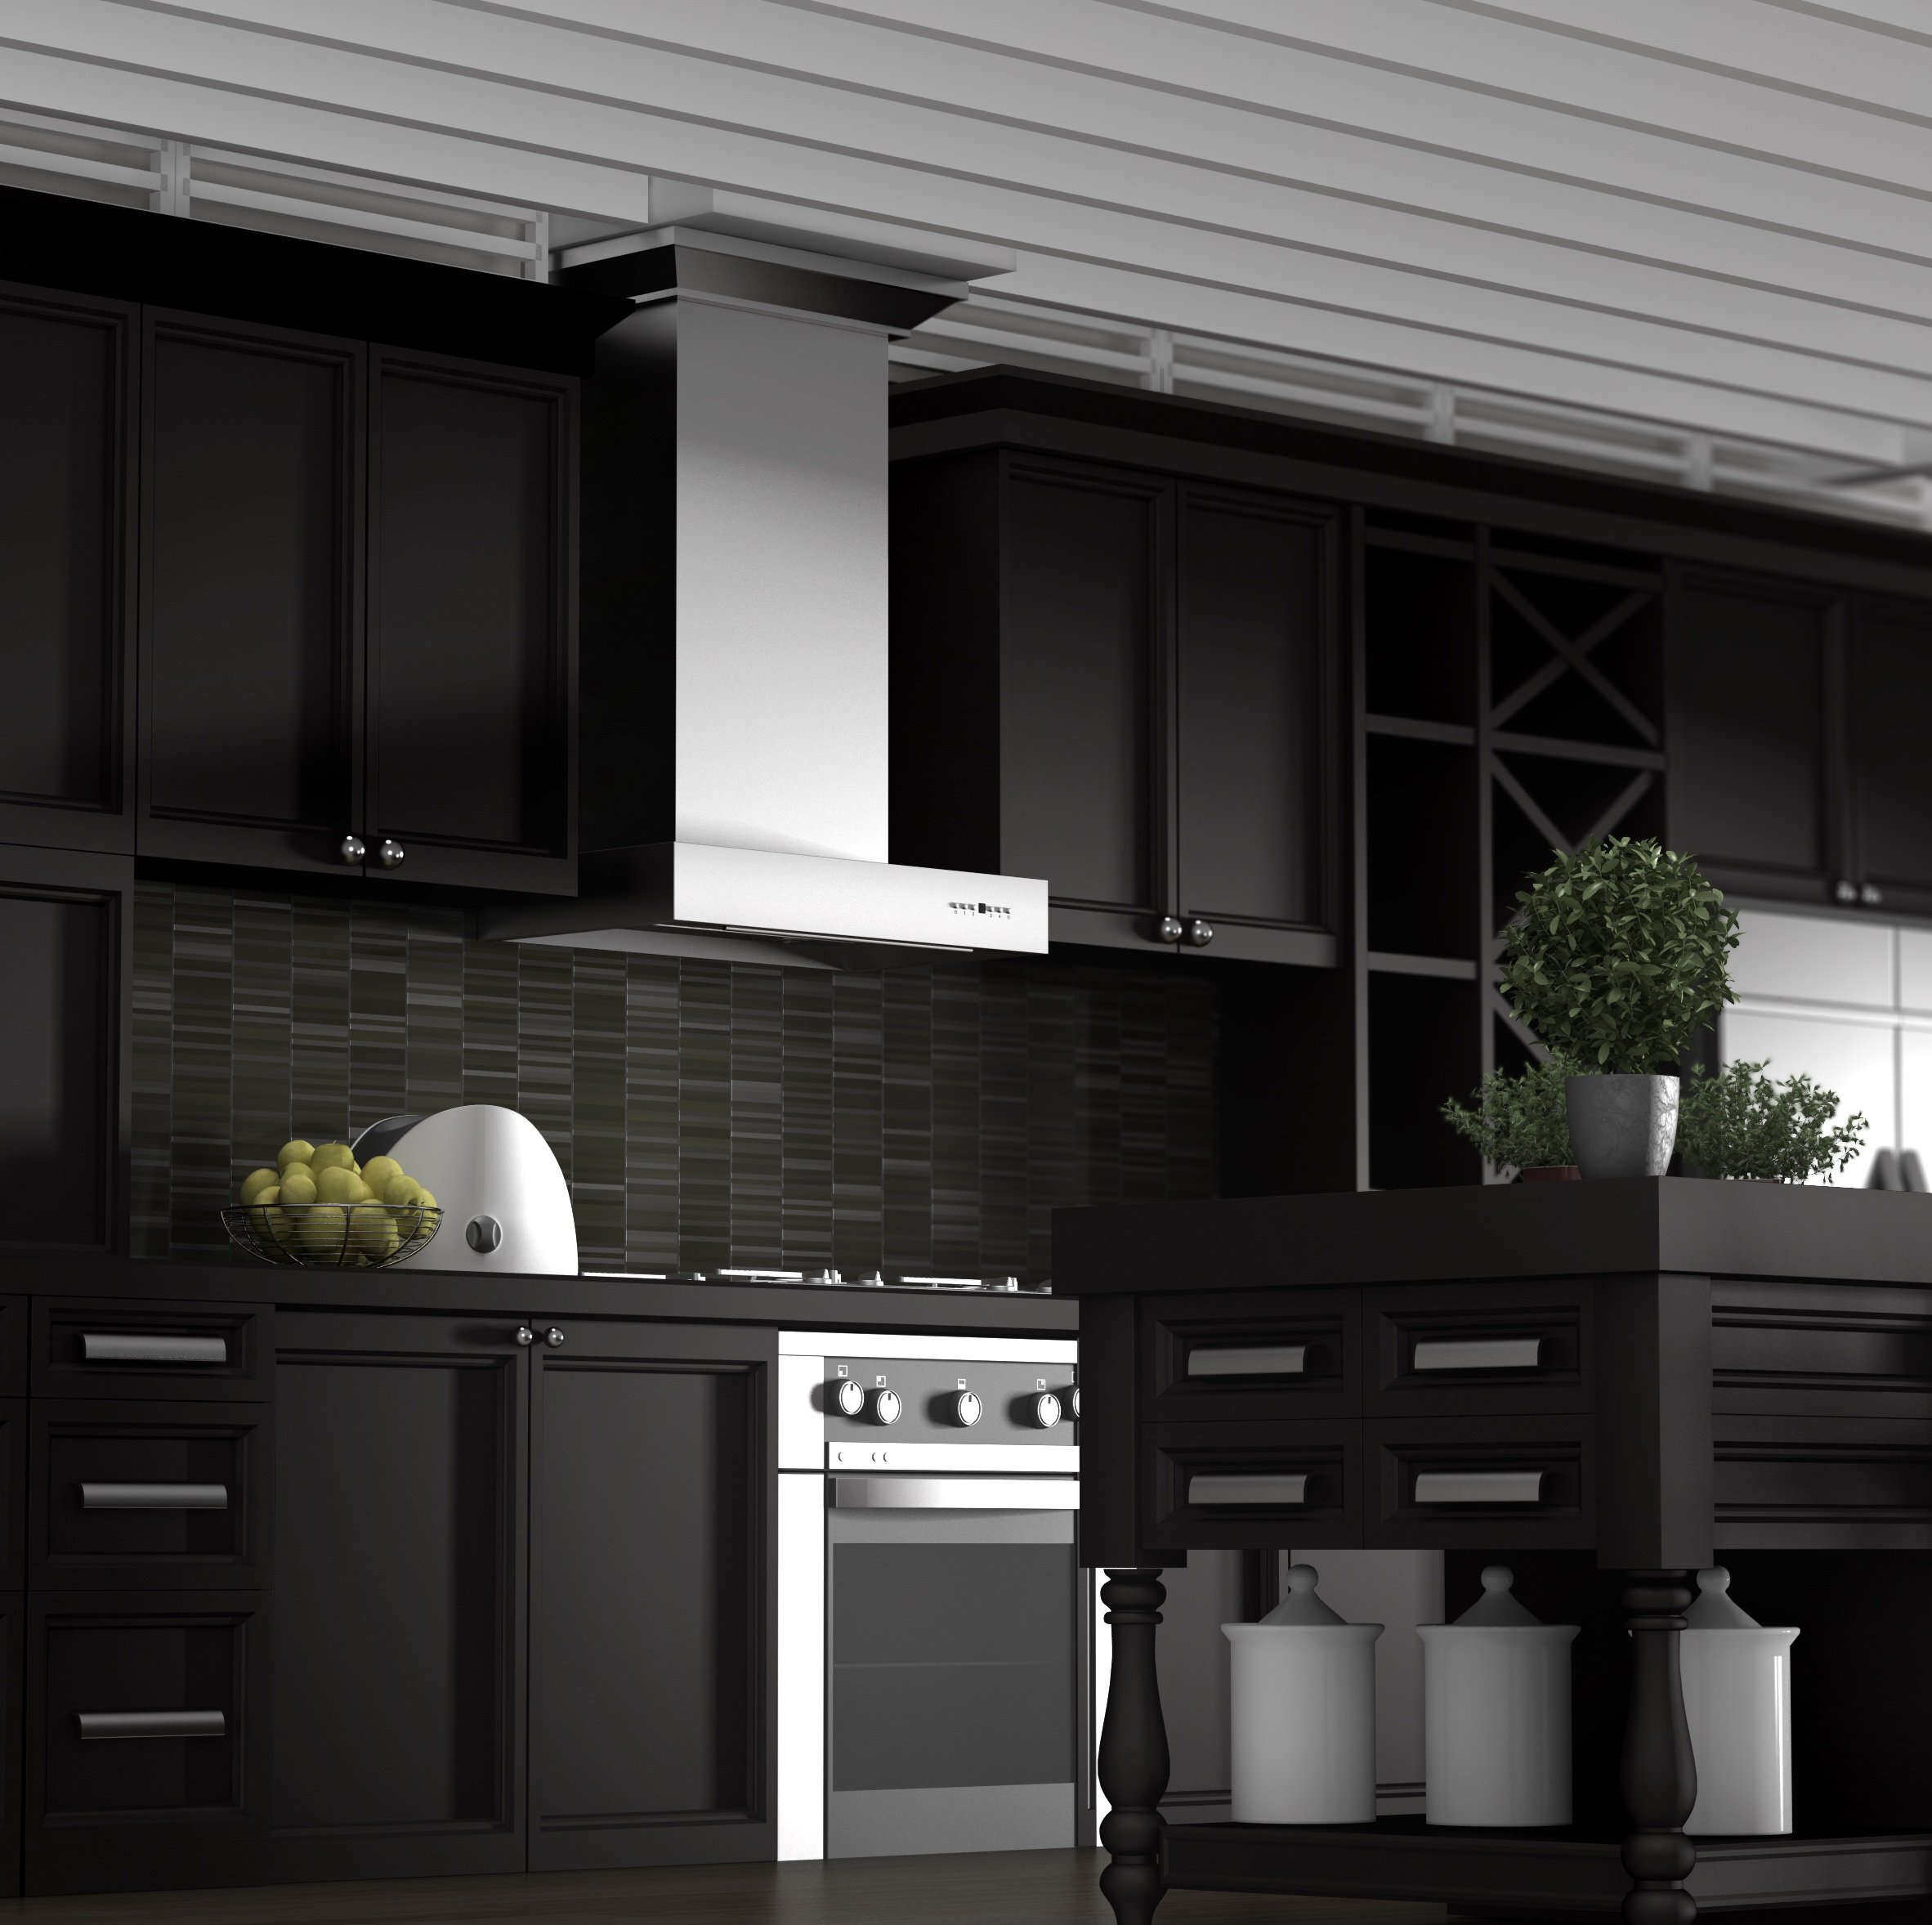 zline-stainless-steel-wall-mounted-range-hood-KECOM-kitchen.jpg